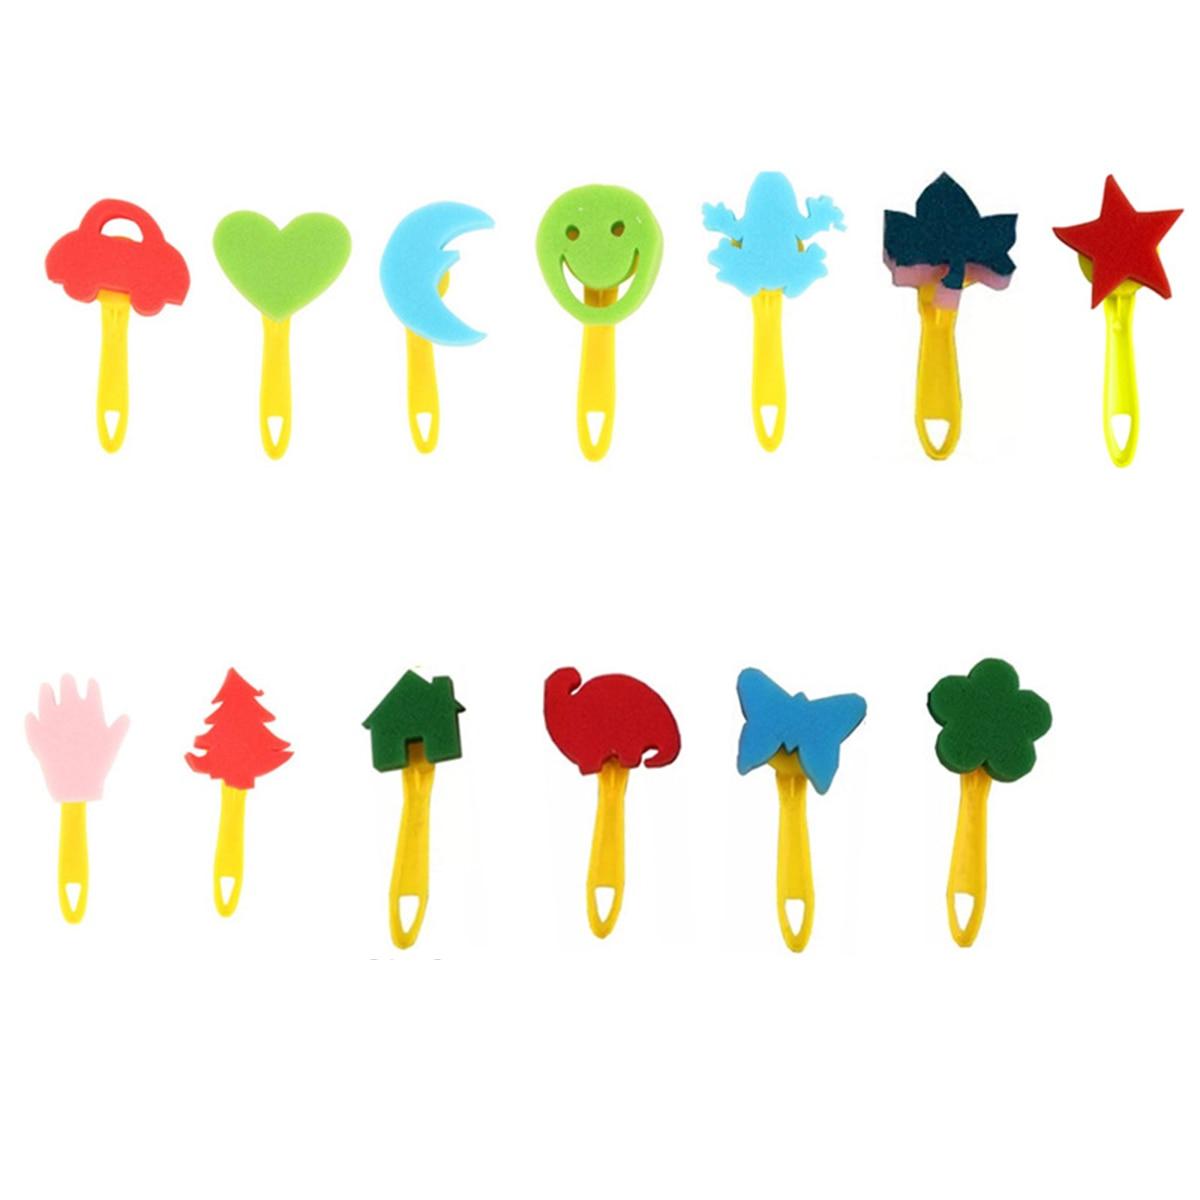 SH-RuiDu 31pcs//lot Washable Kids Early Learning Sponge Painting Brushes Kit Child Fun Painting Brushes Long Sleeve Waterproof Apron